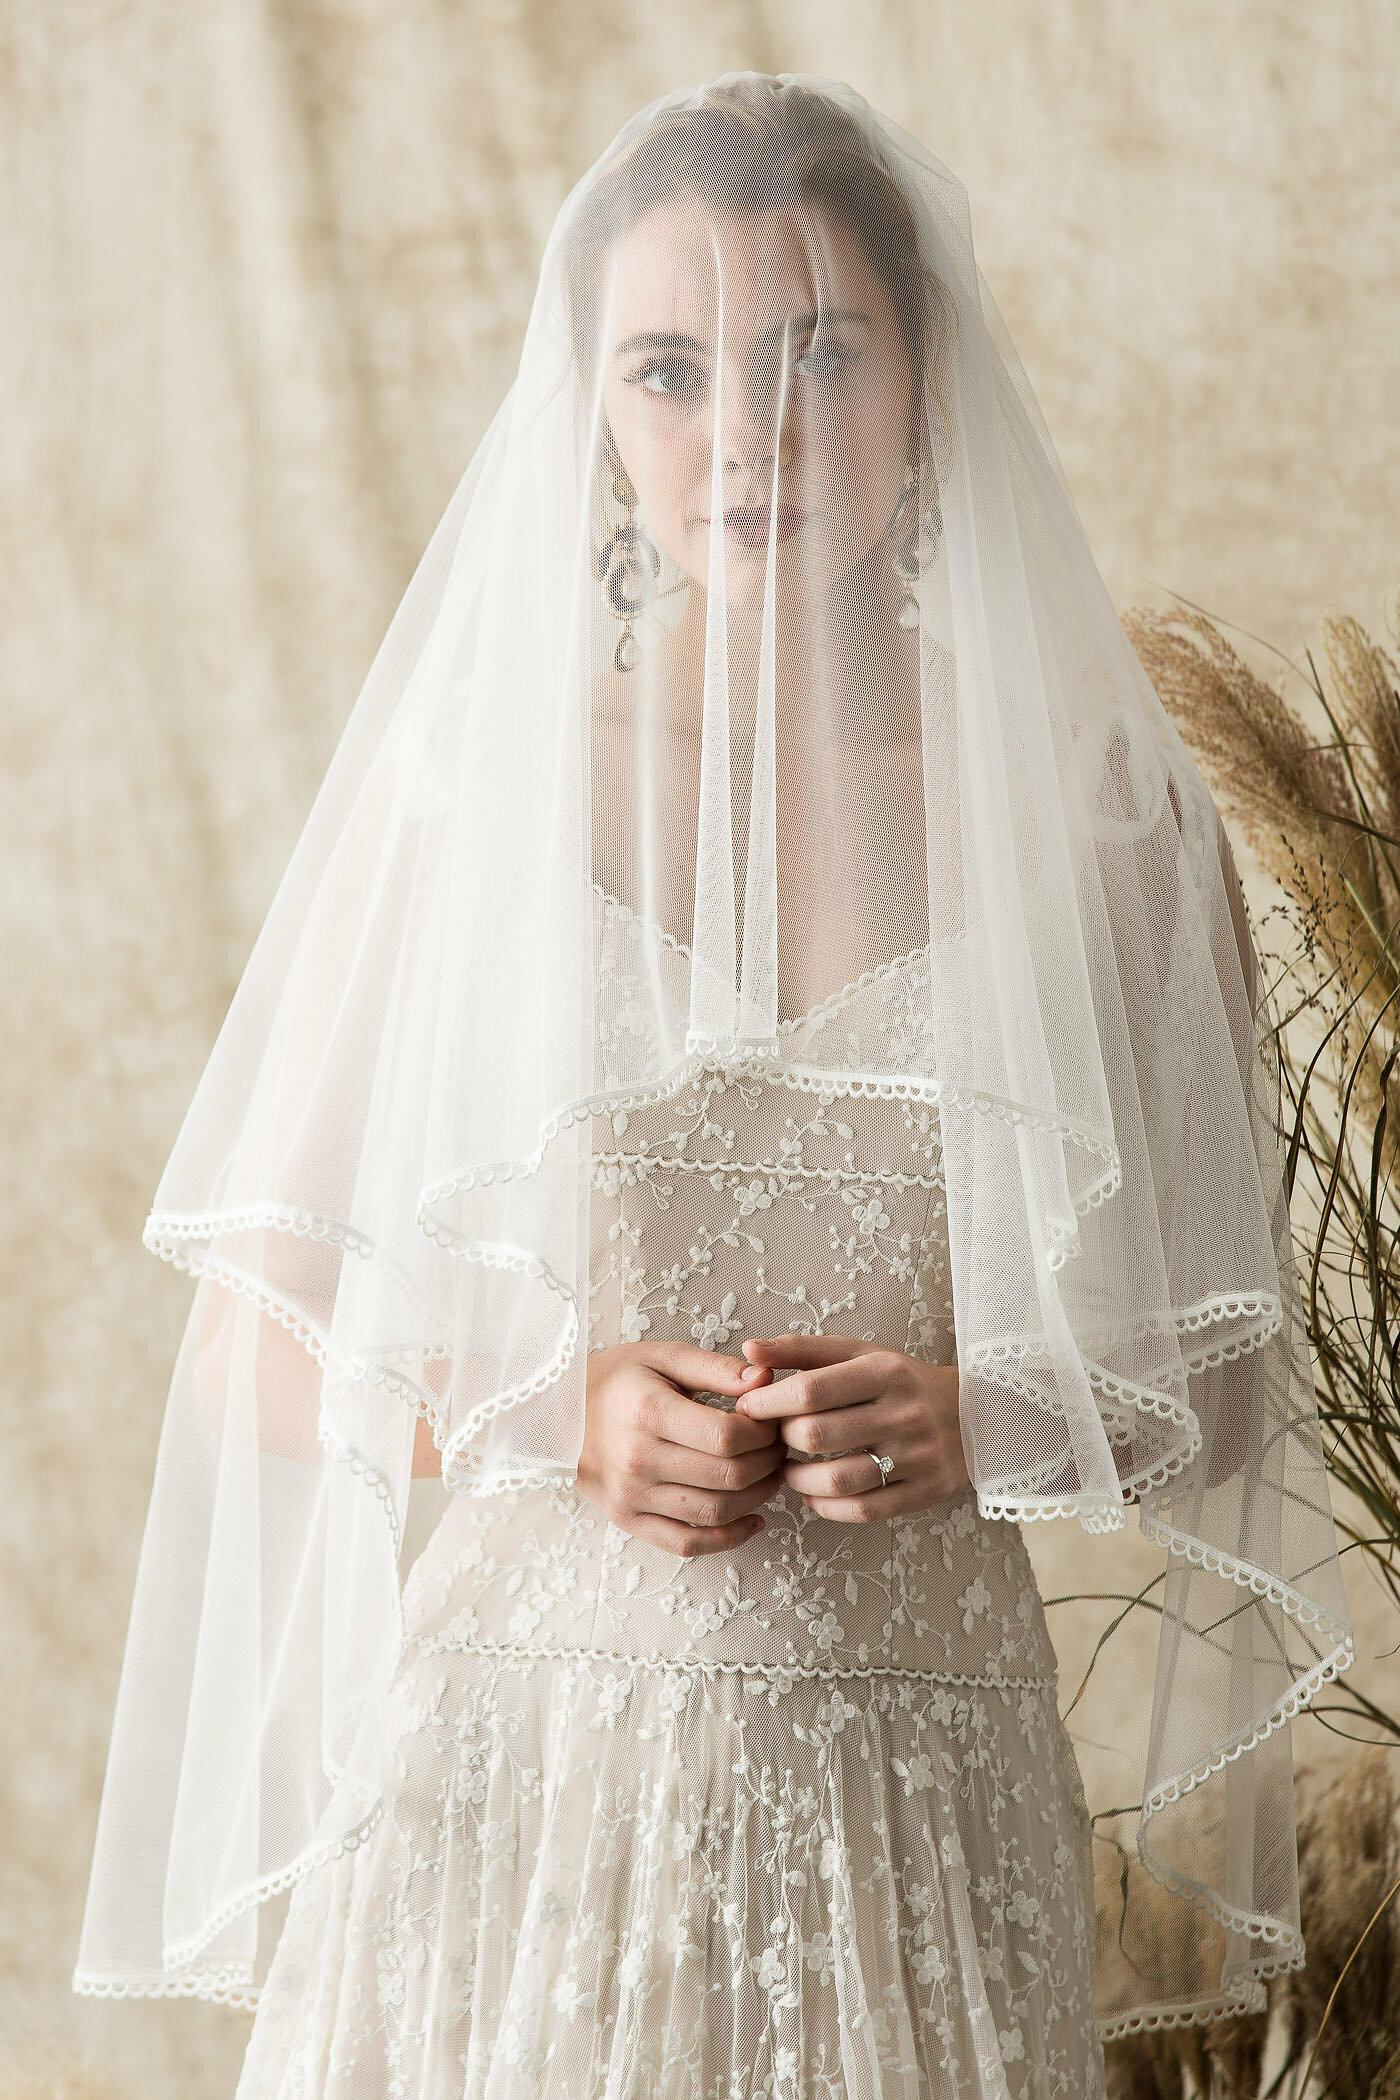 megan-blusher-short-veil-with-lace-edging